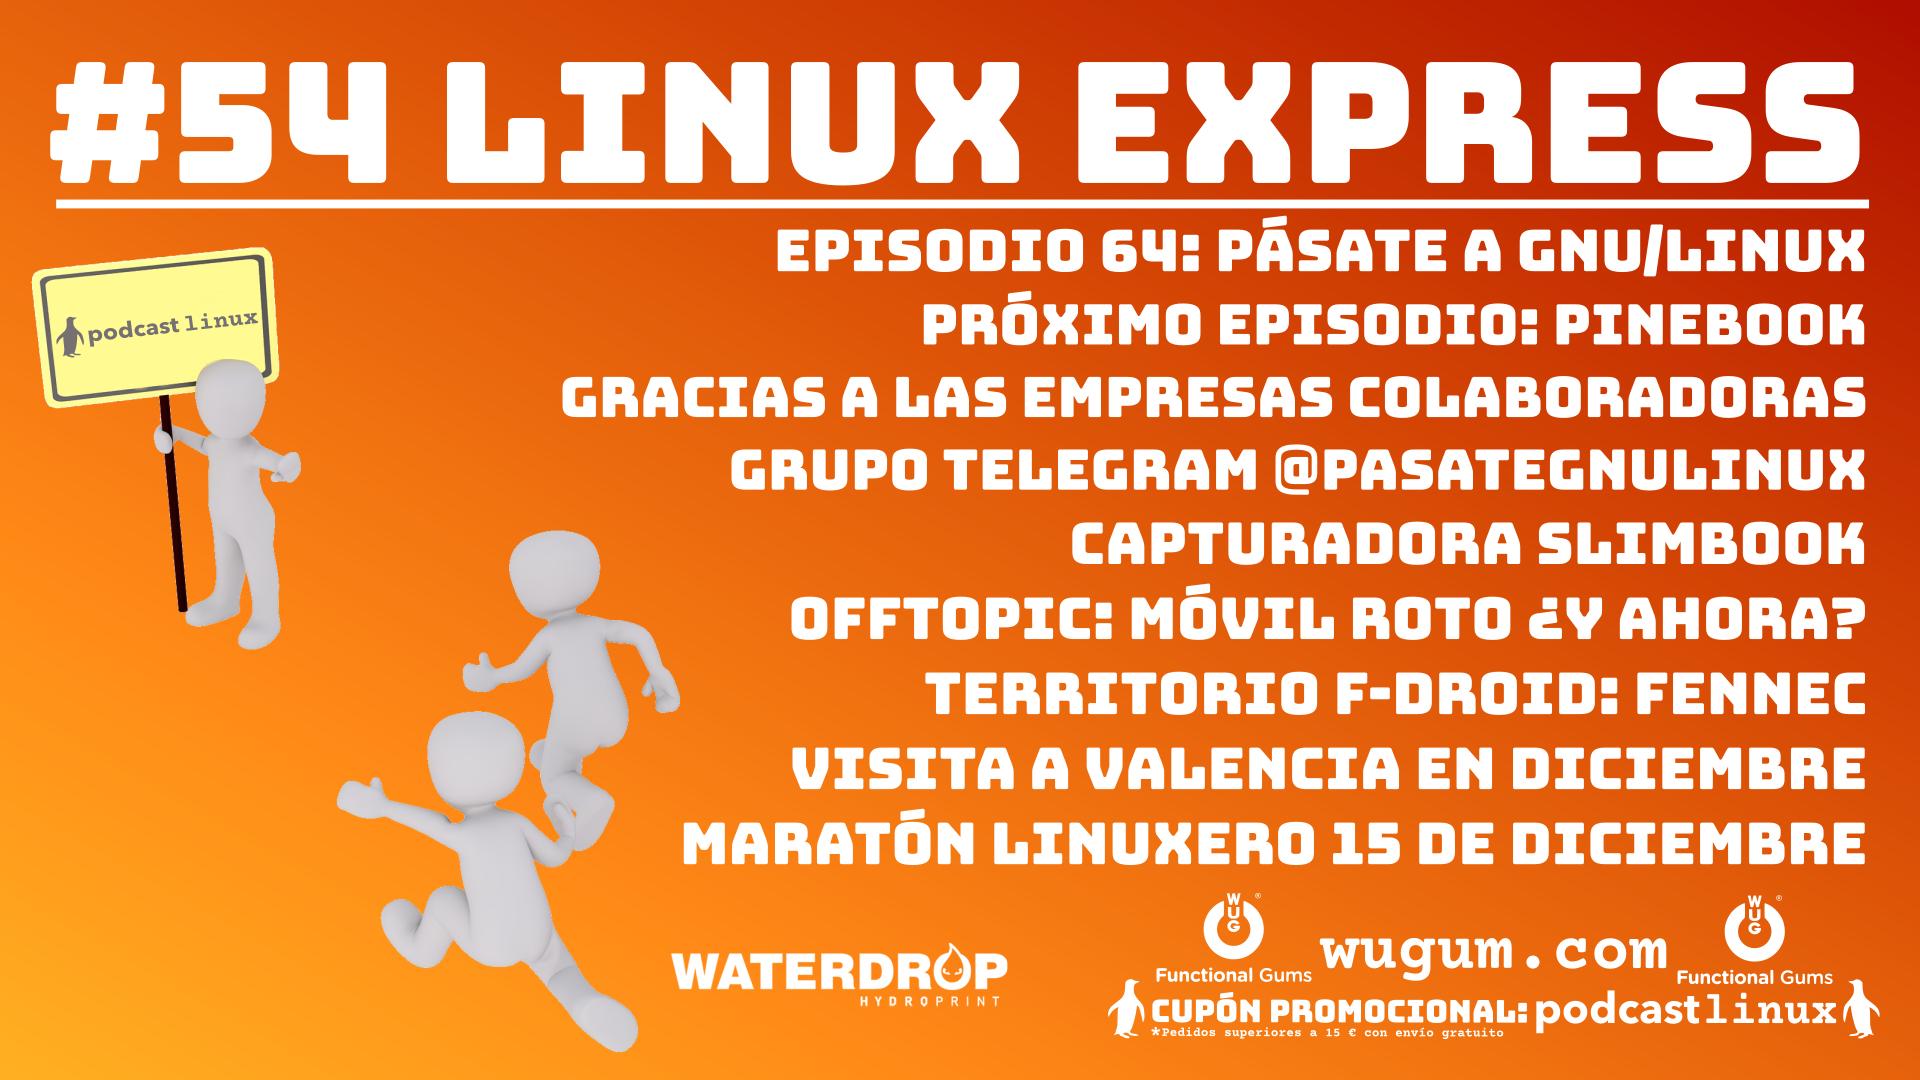 #54 Linux Express